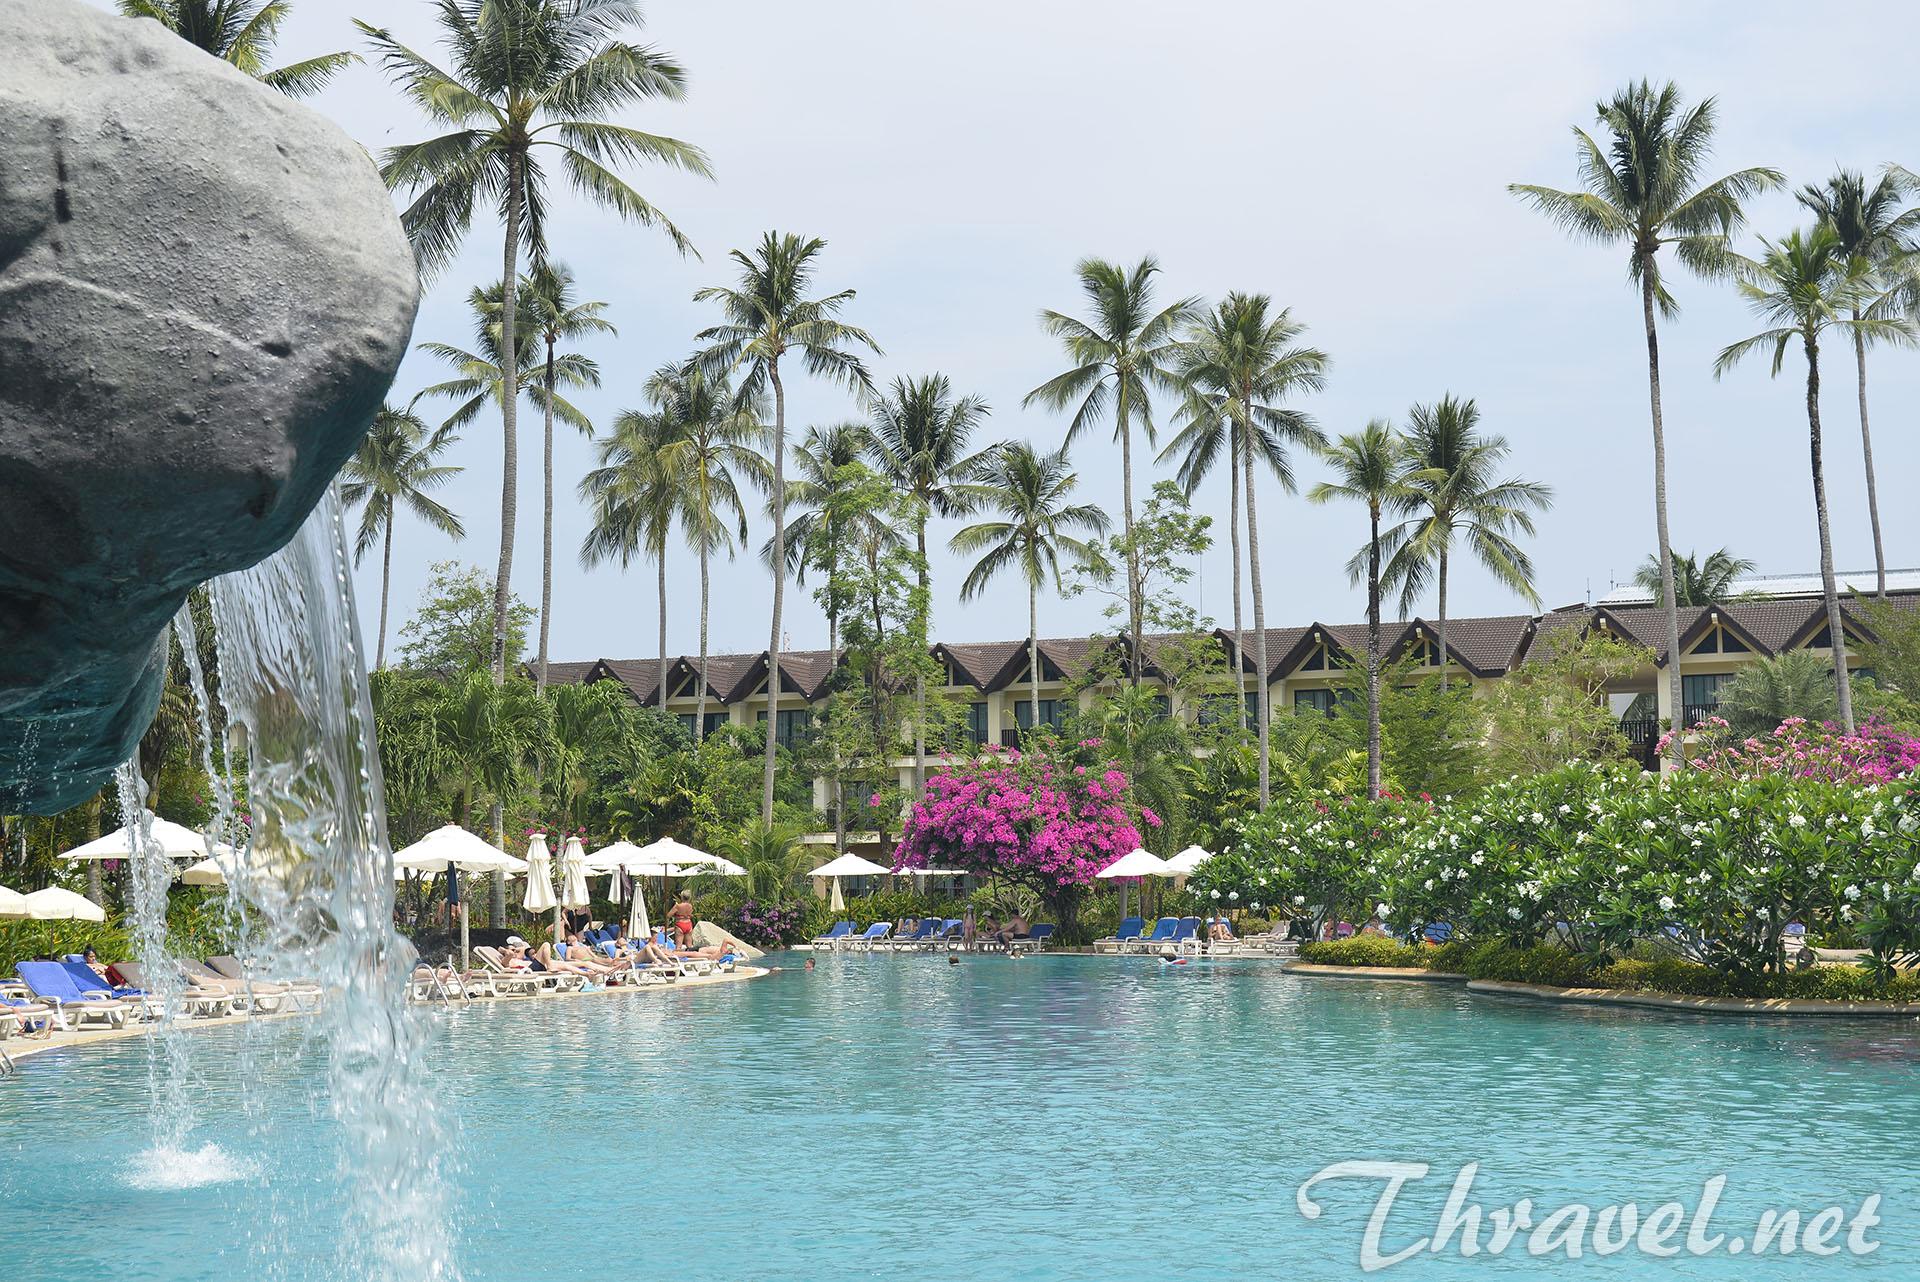 duangjitt-resort-and-spa-hotel-patong-beach-phuket-thailand-19